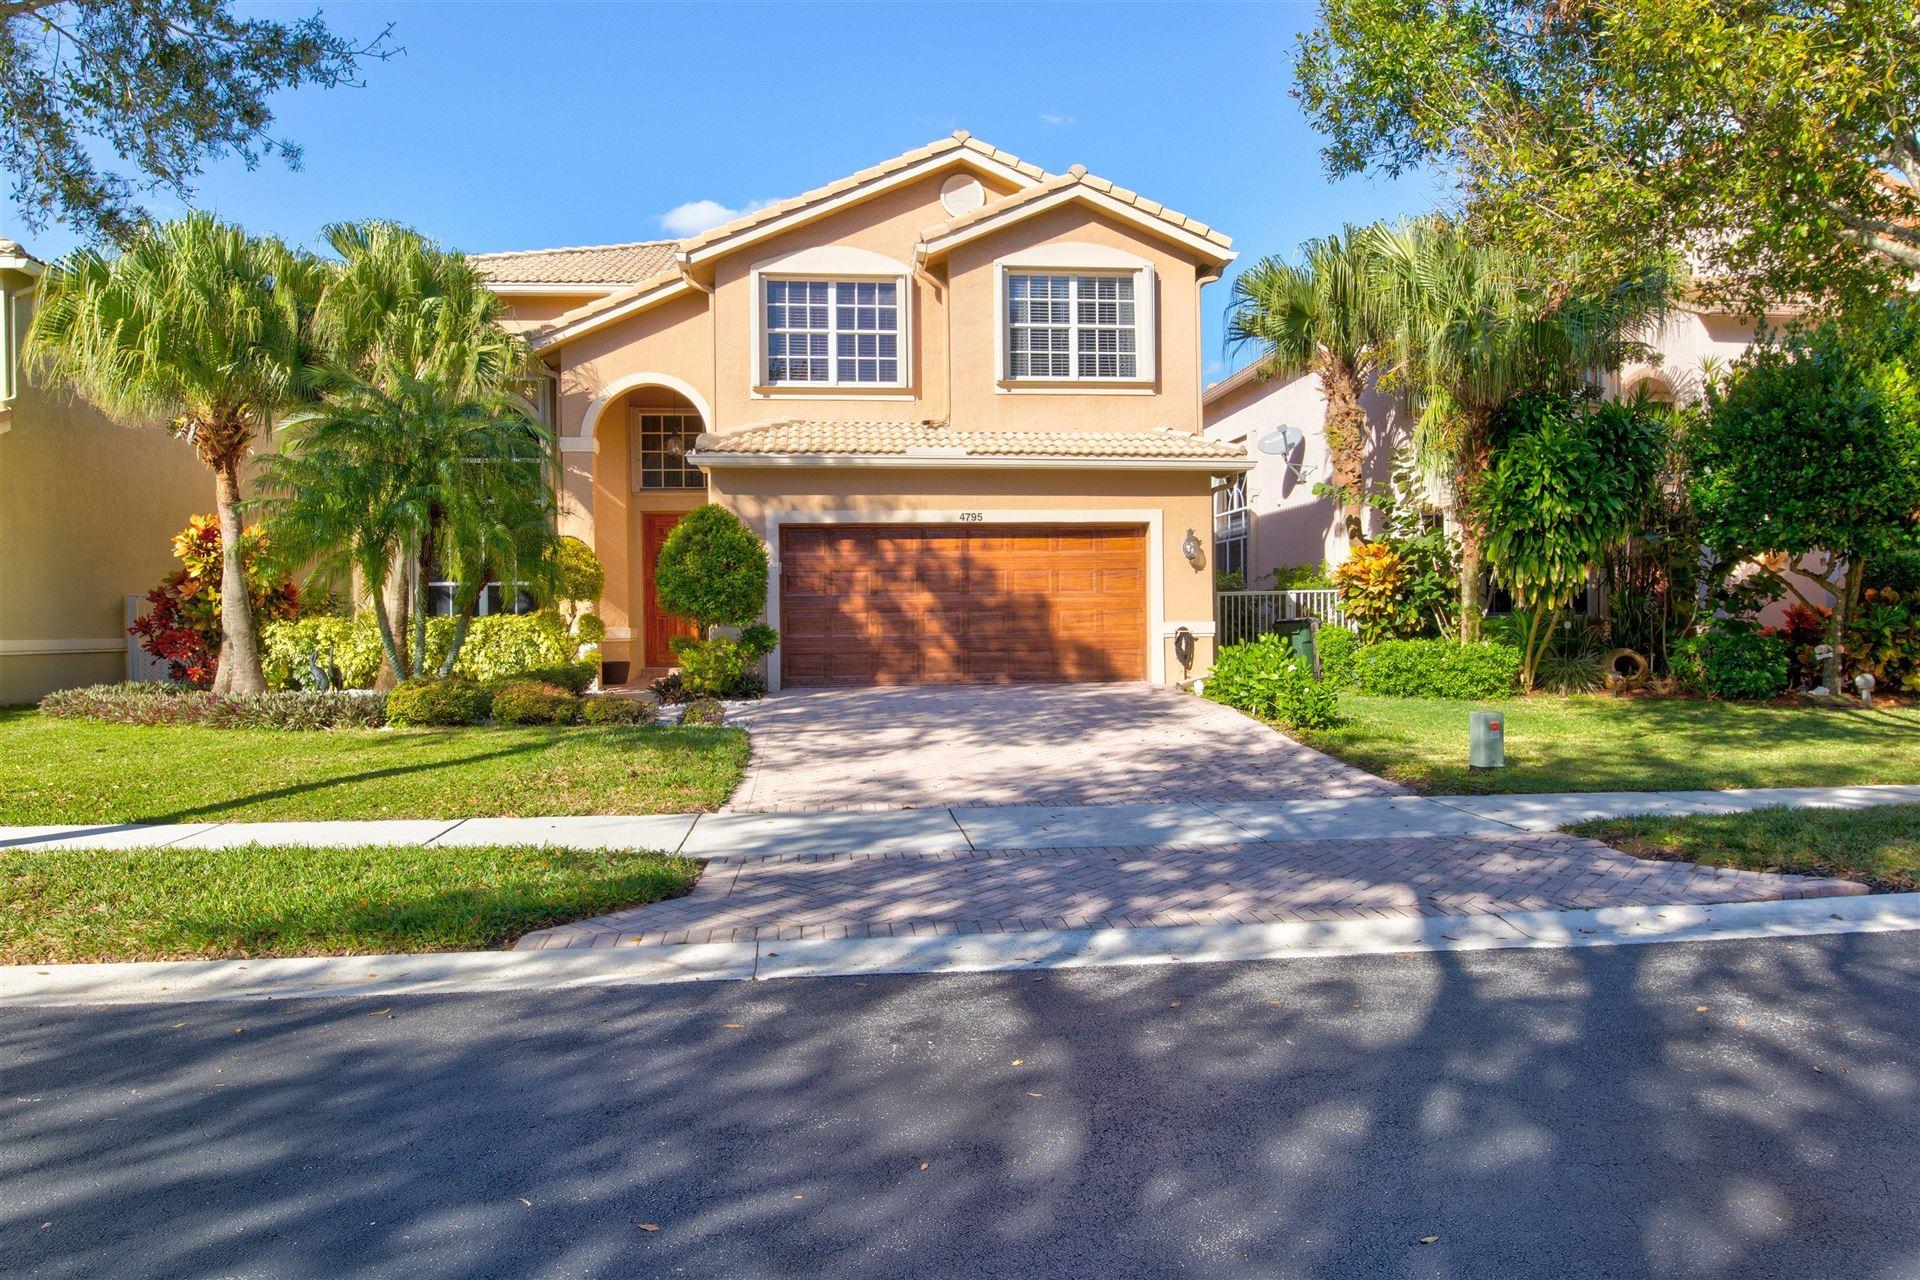 Photo of 4795 S Classical Boulevard, Delray Beach, FL 33445 (MLS # RX-10675756)